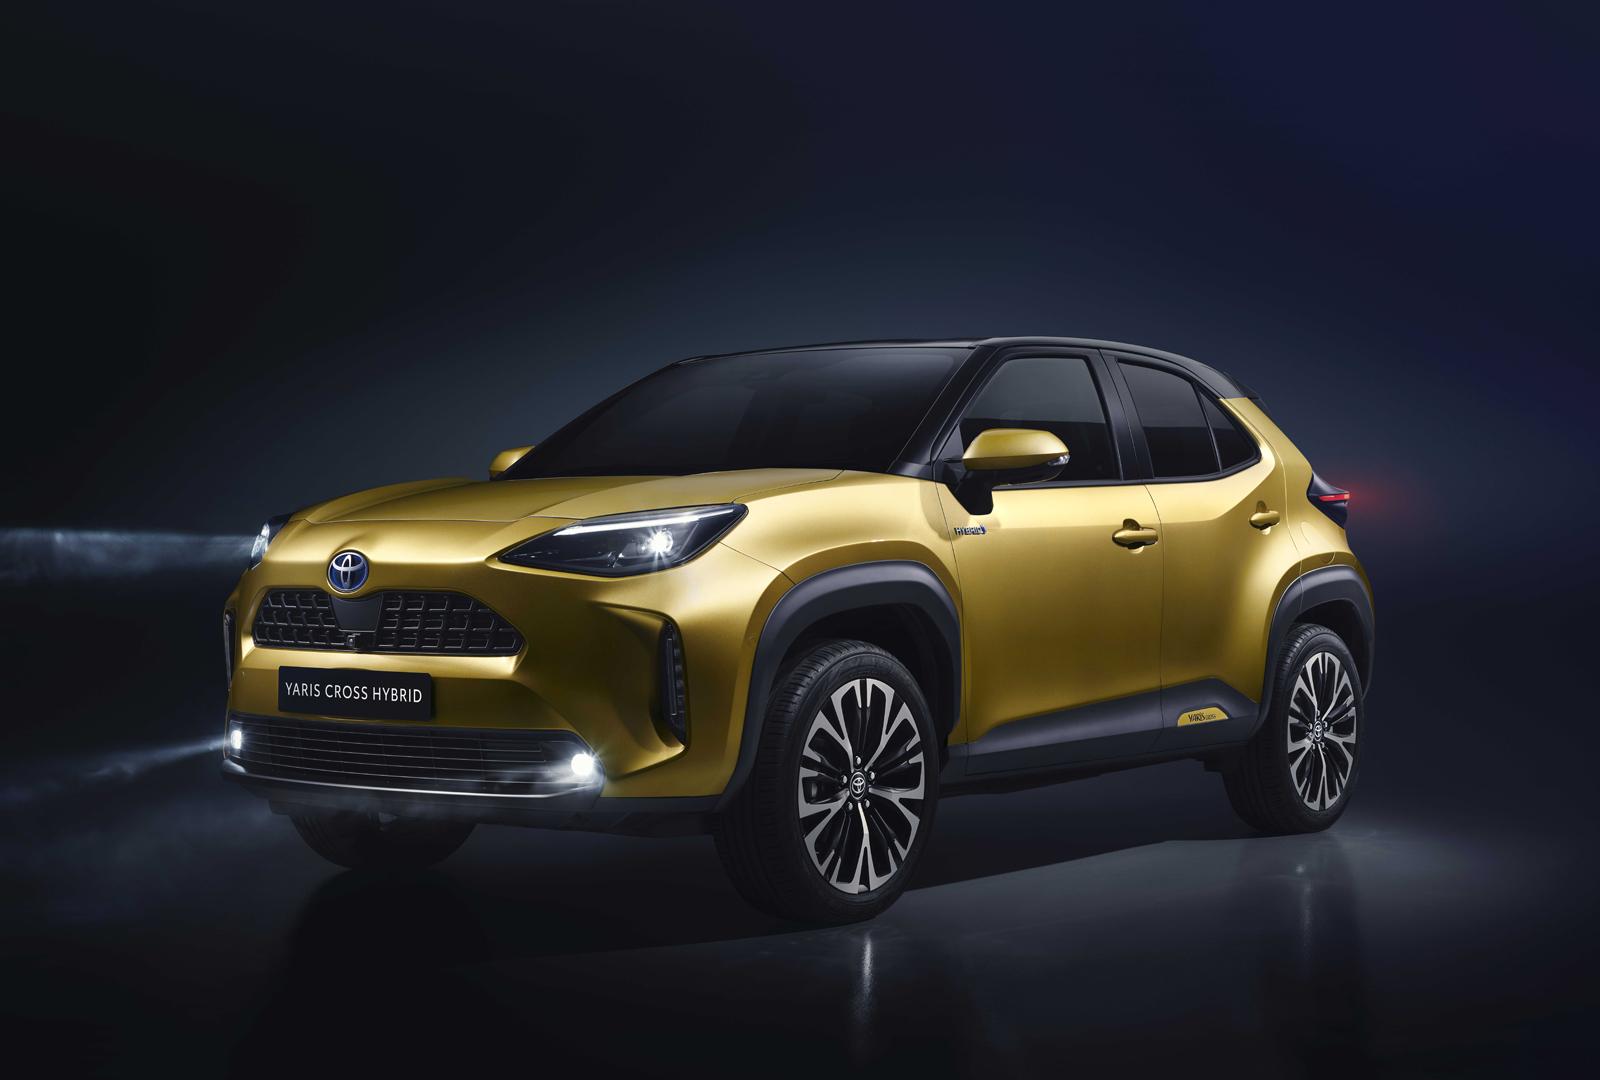 Vídeo del nuevo Toyota Yaris Cross 2021: el gran rival del Peugeot 2008